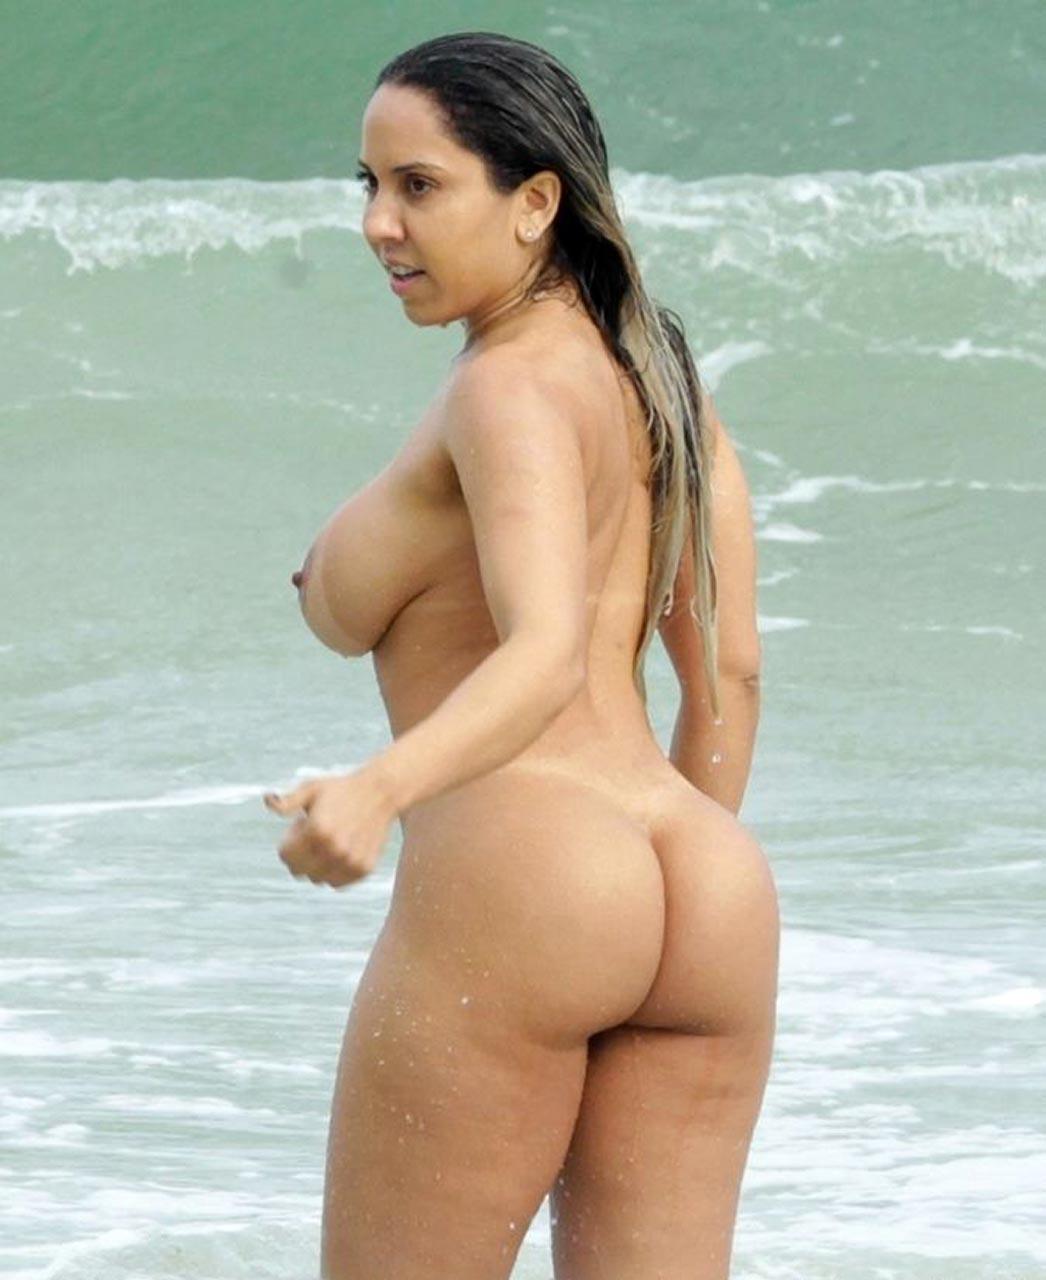 Brazilian Model Renata Frisson Nude On The Beach - Scandal -1893